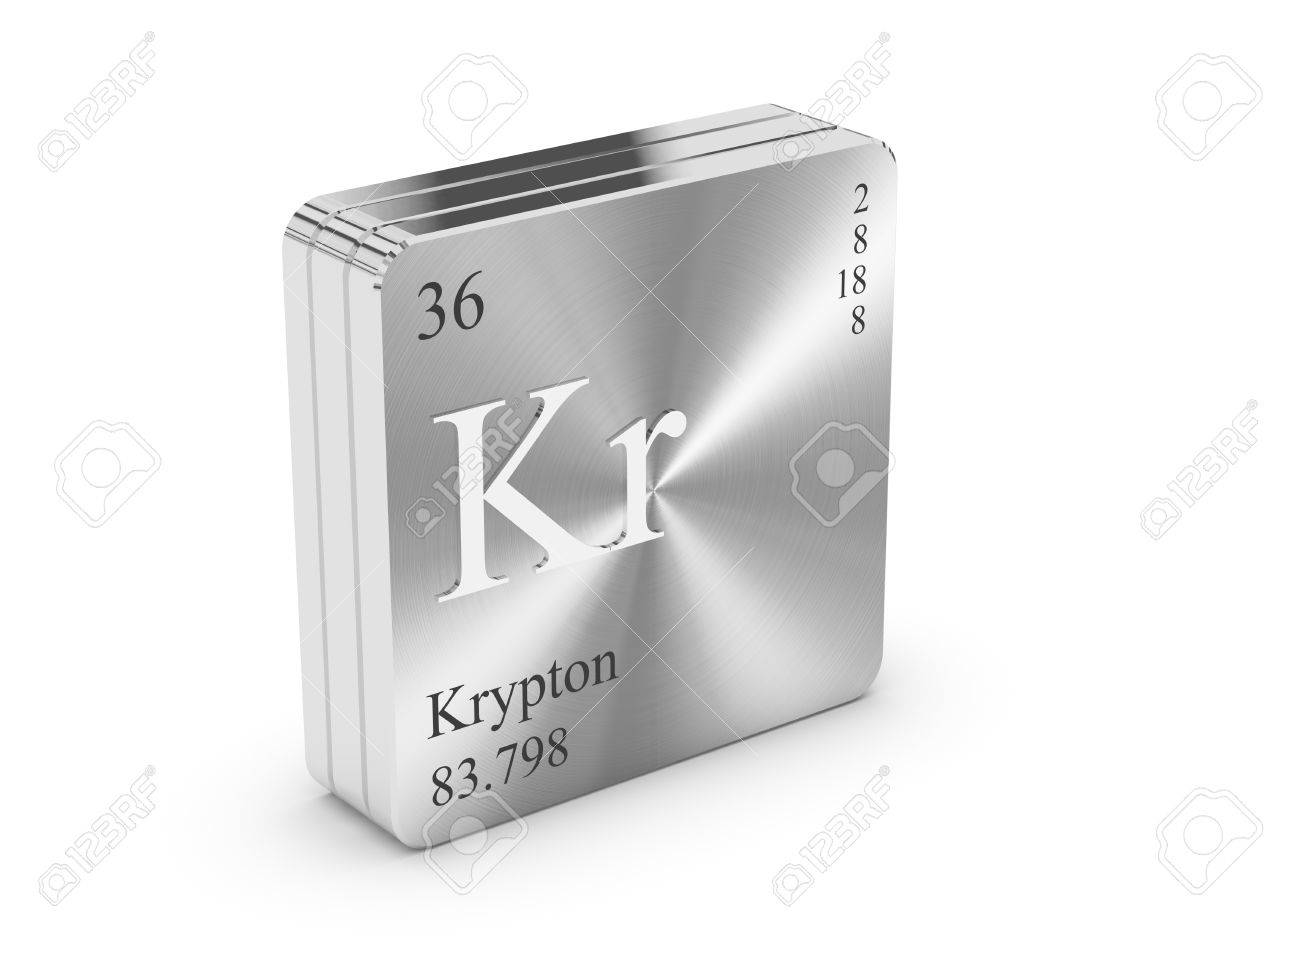 Krypton on the periodic table gallery periodic table images 36 periodic table images periodic table images krypton symbol periodic table choice image periodic table images gamestrikefo Images